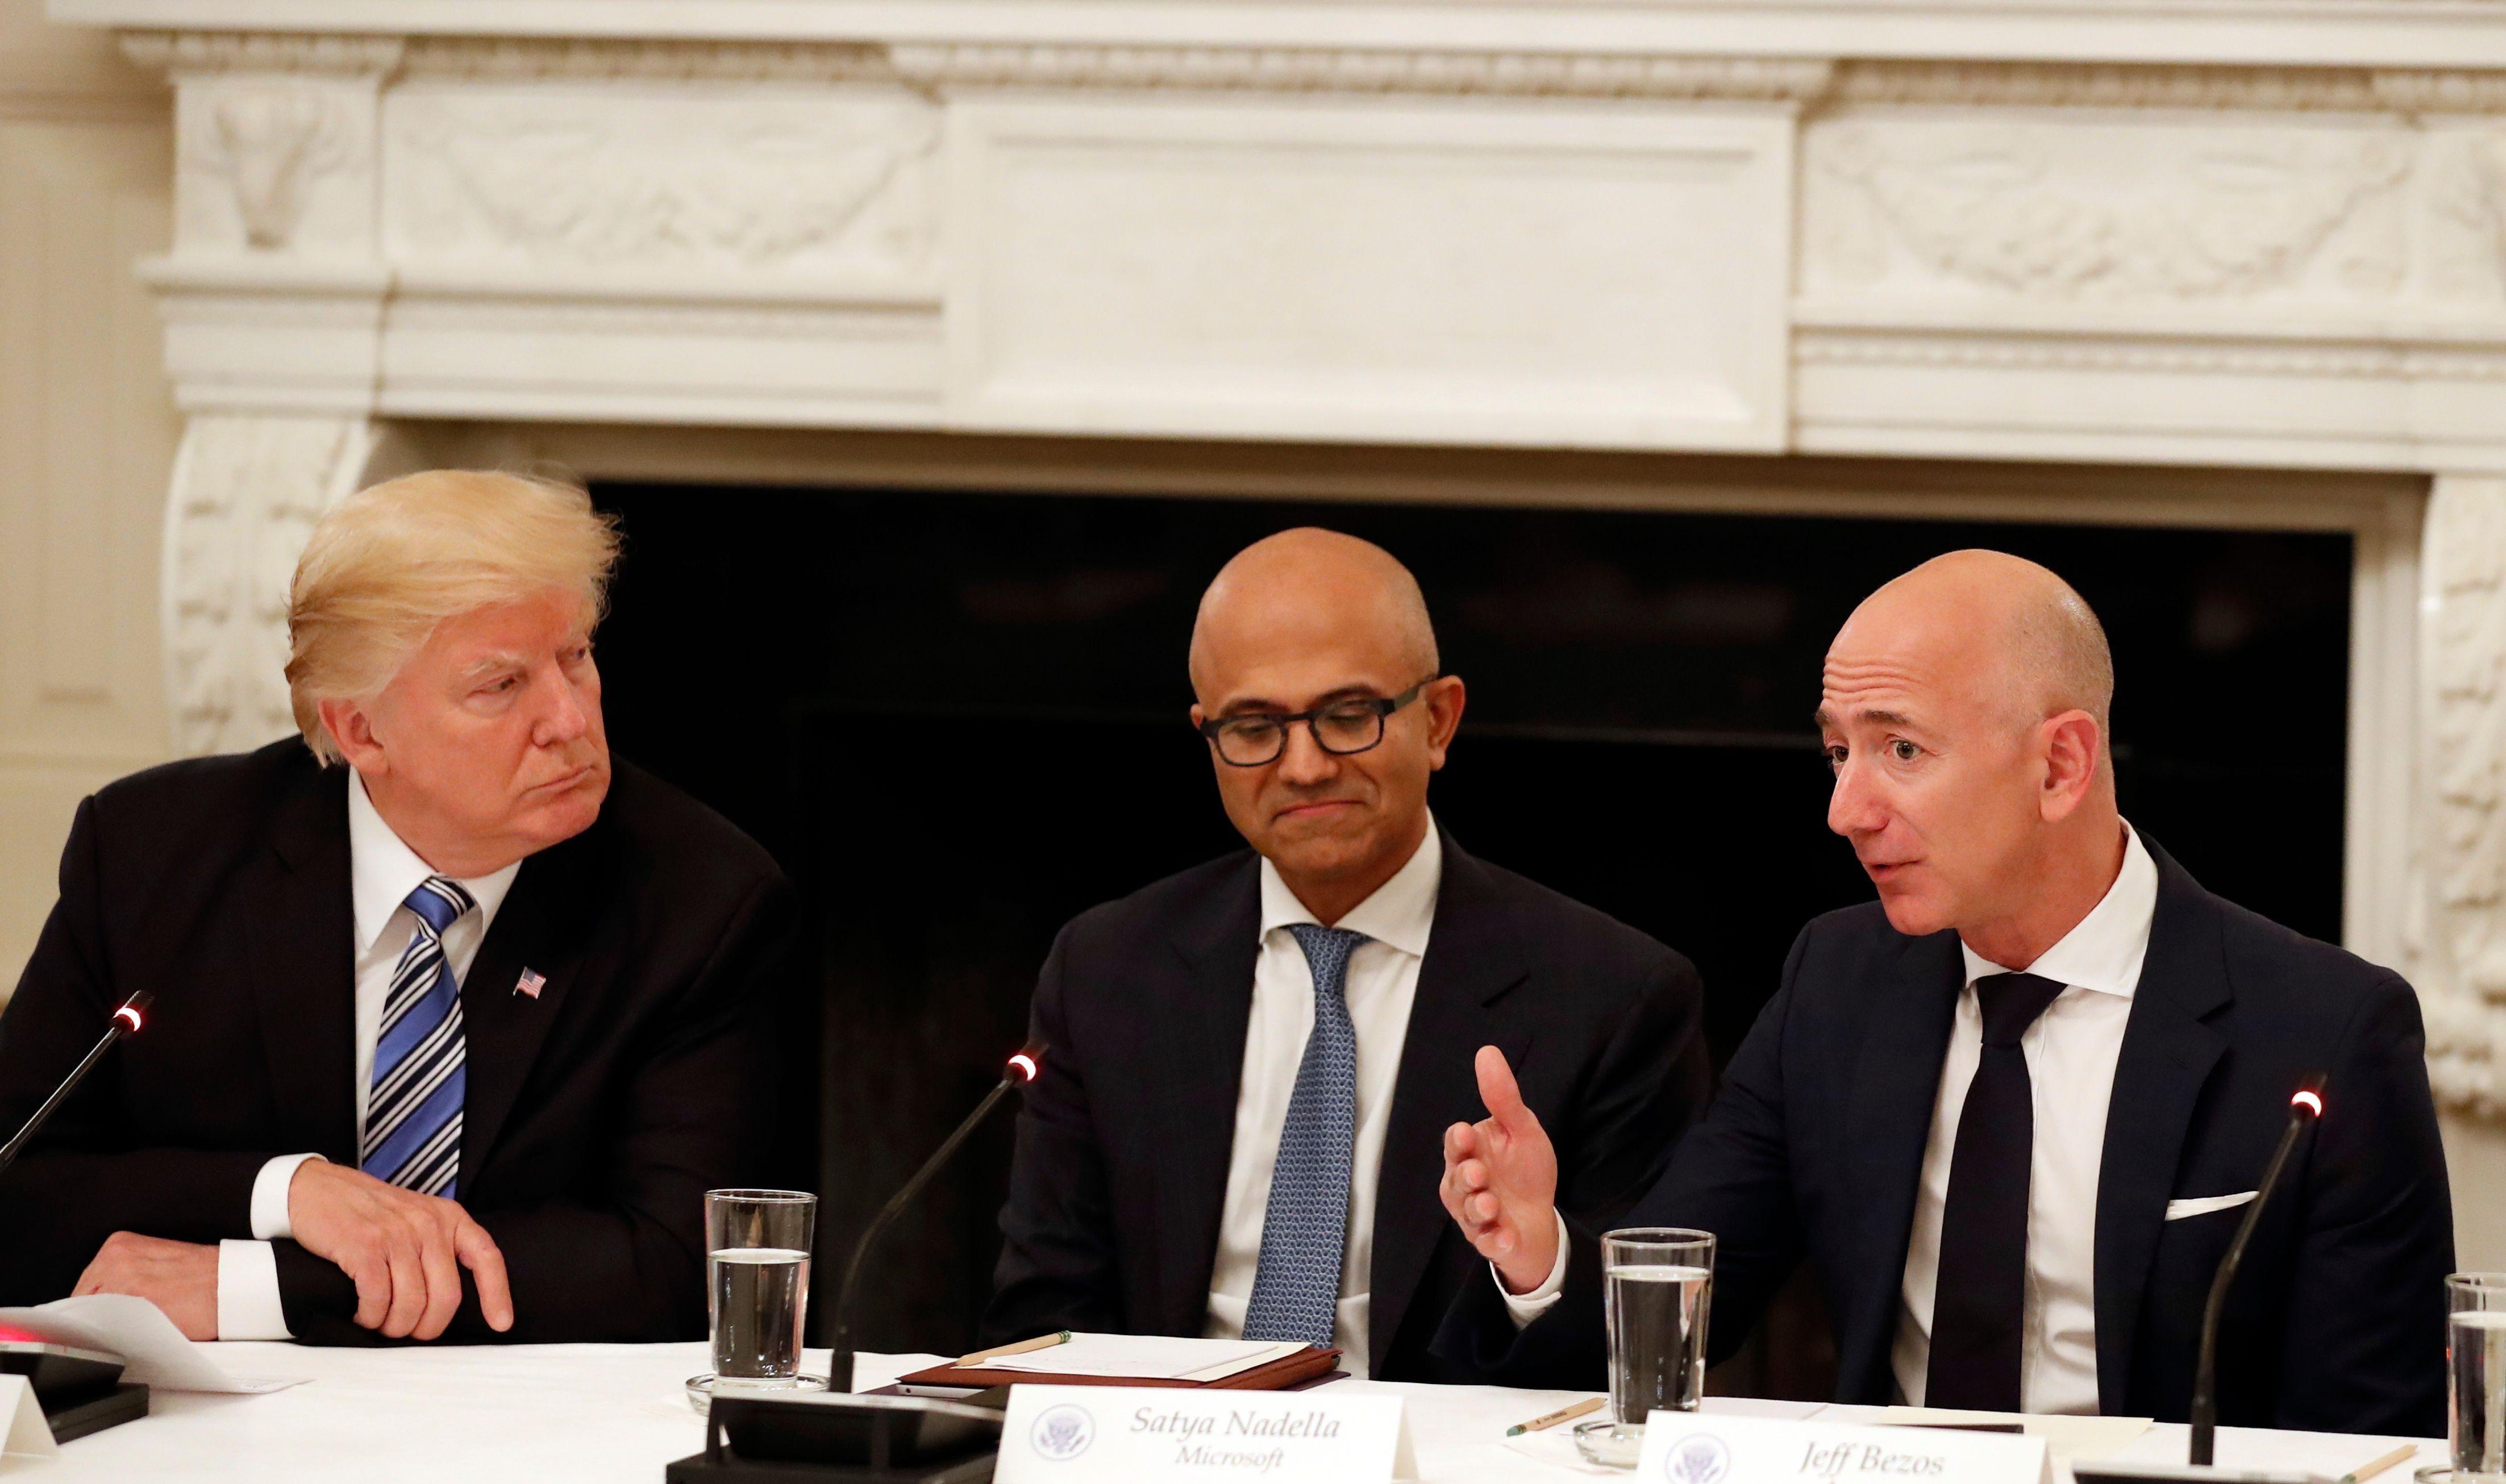 Jeff Bezos's amazon is more popular than Donald Trump in America